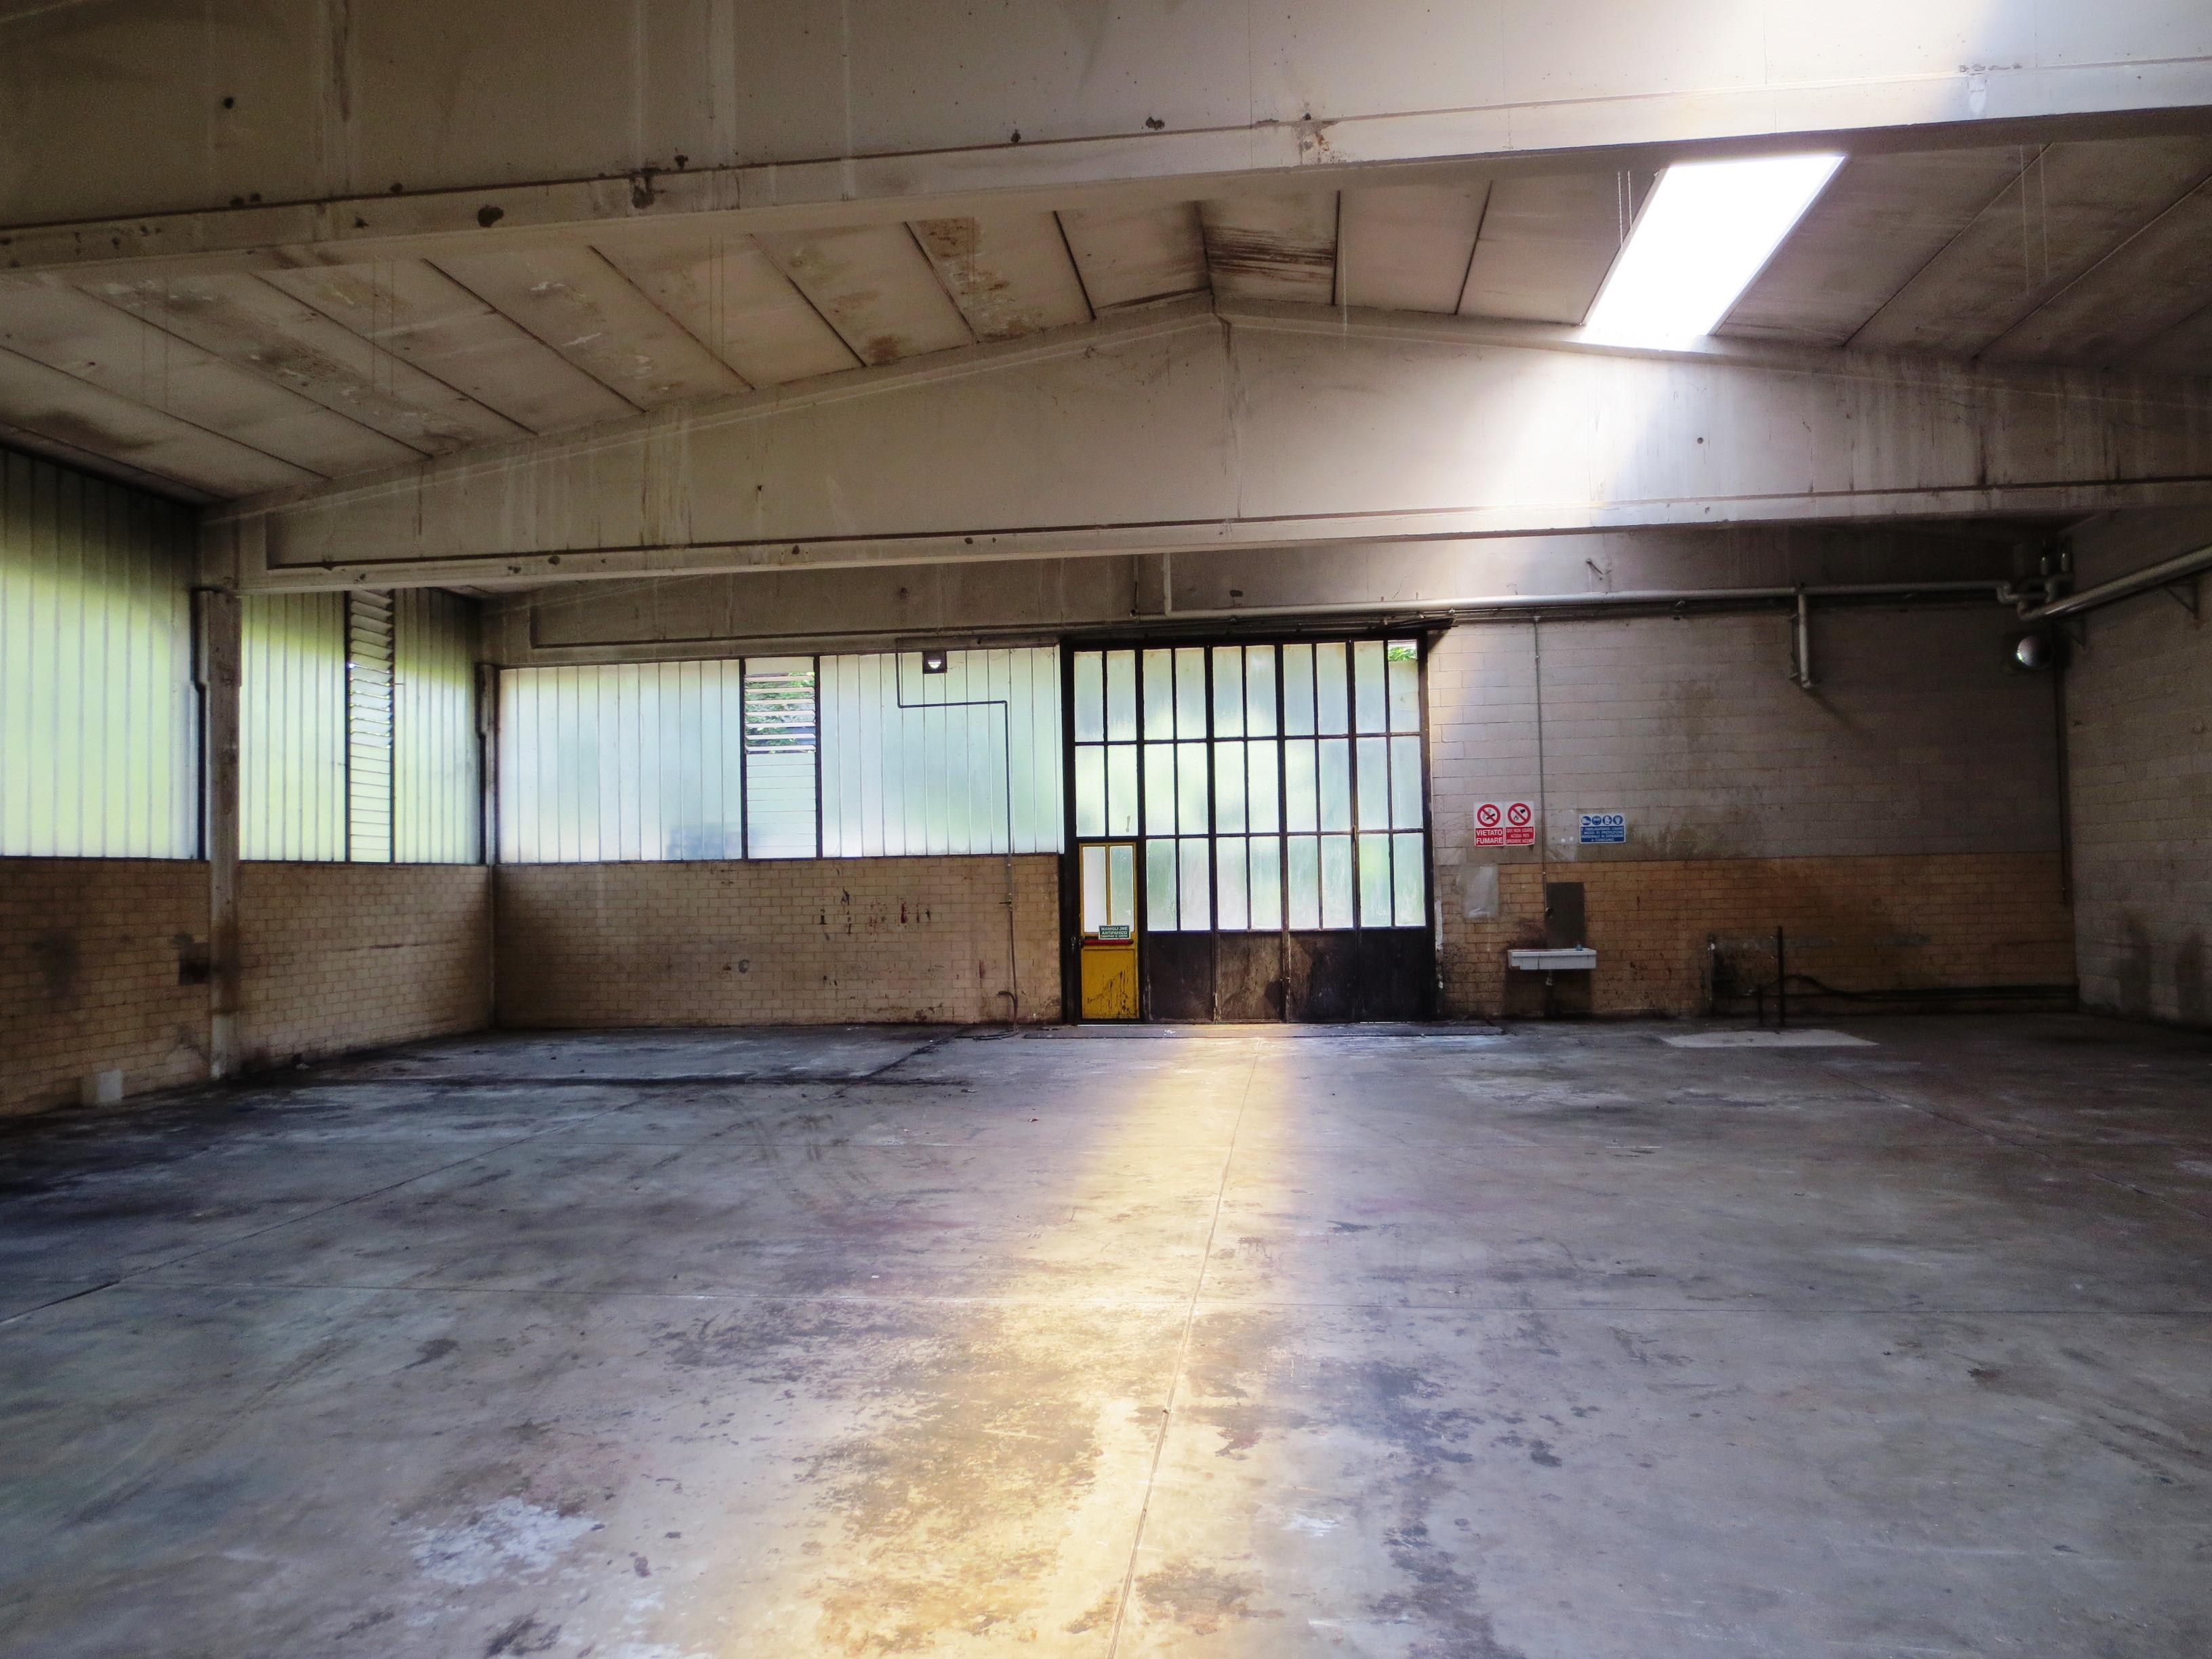 2201 - CARATE BRIANZA Porzione di capannone industriale ...